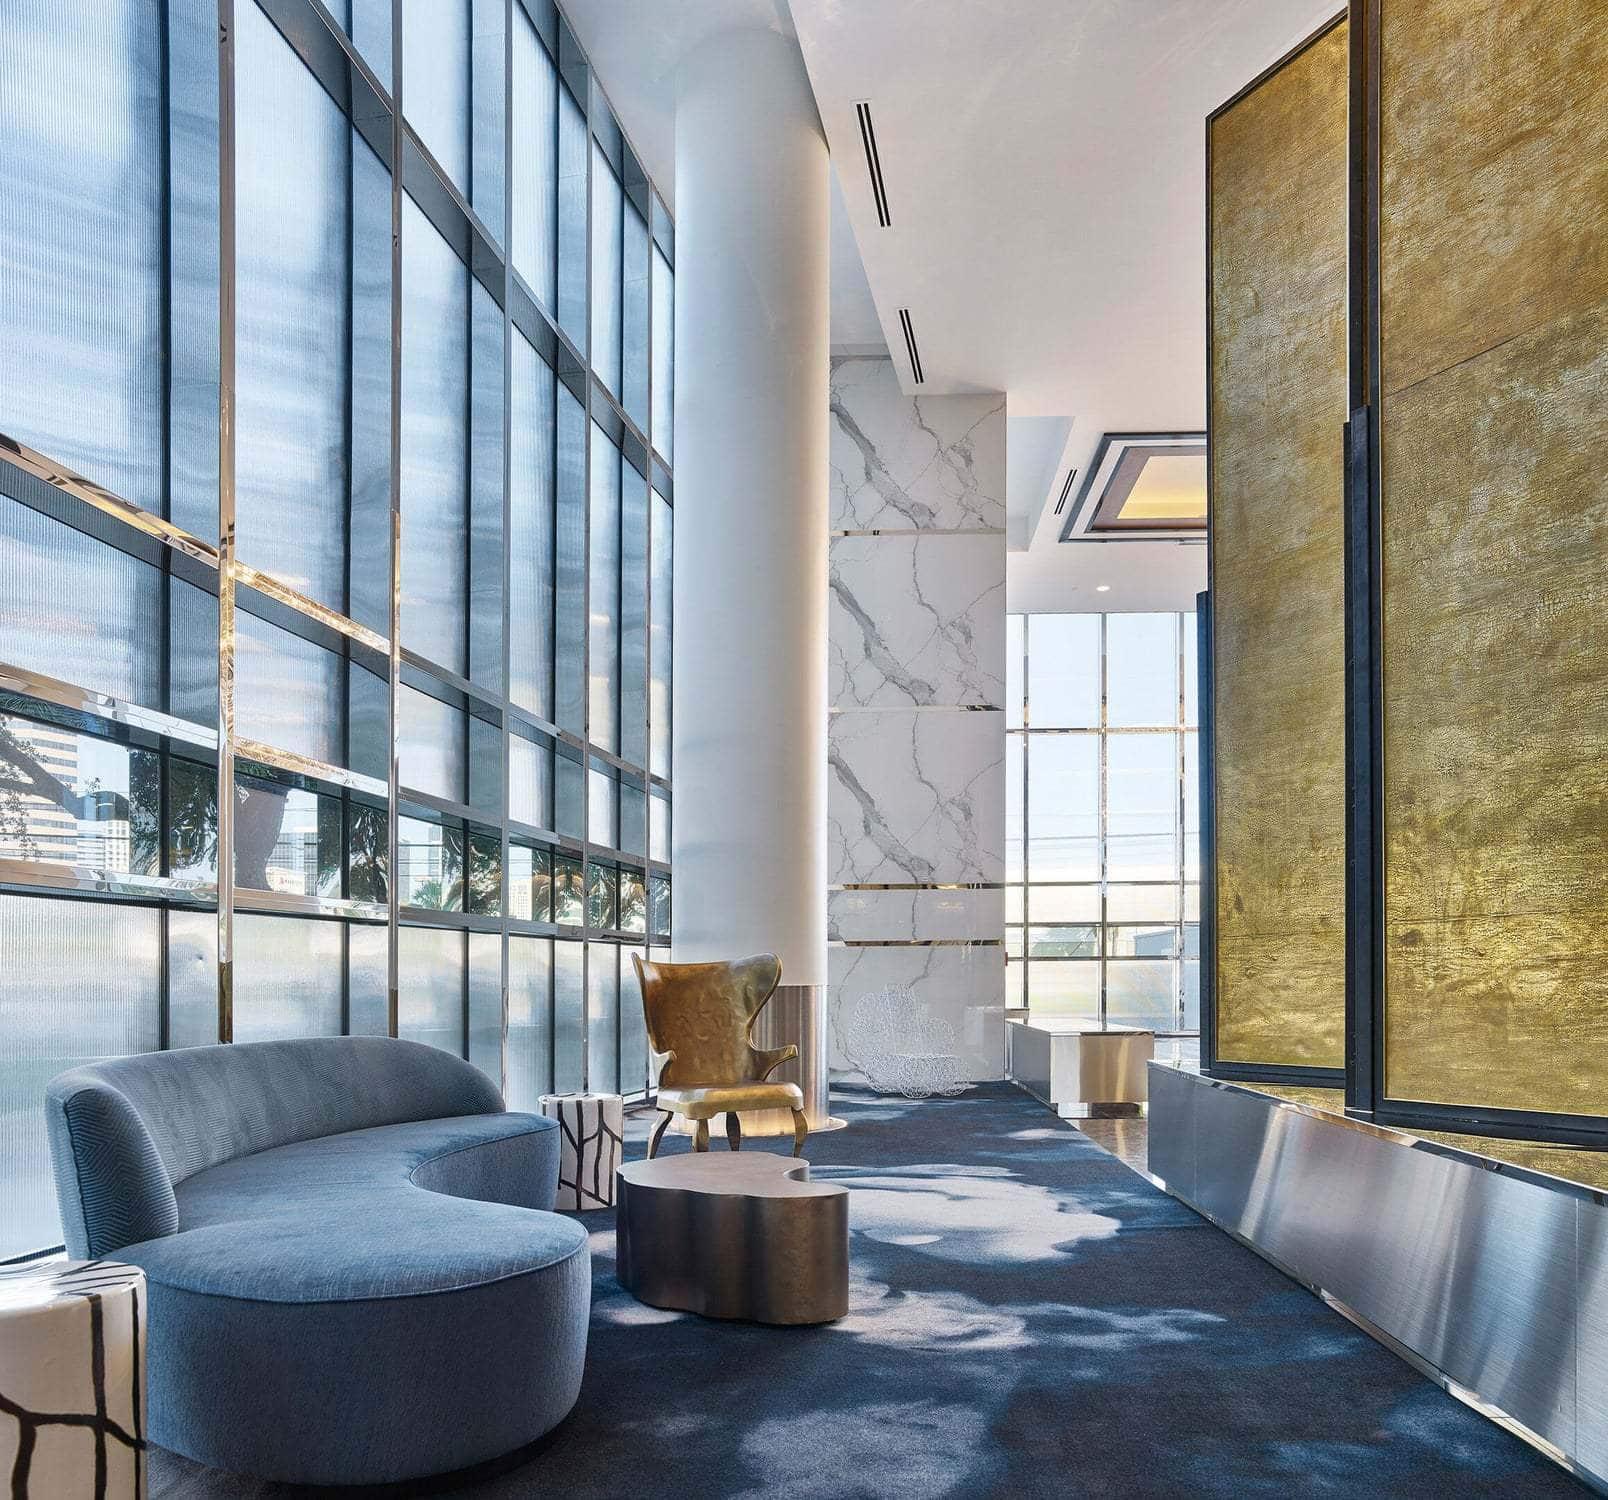 houston's arabella high rise condos lobby waiting area